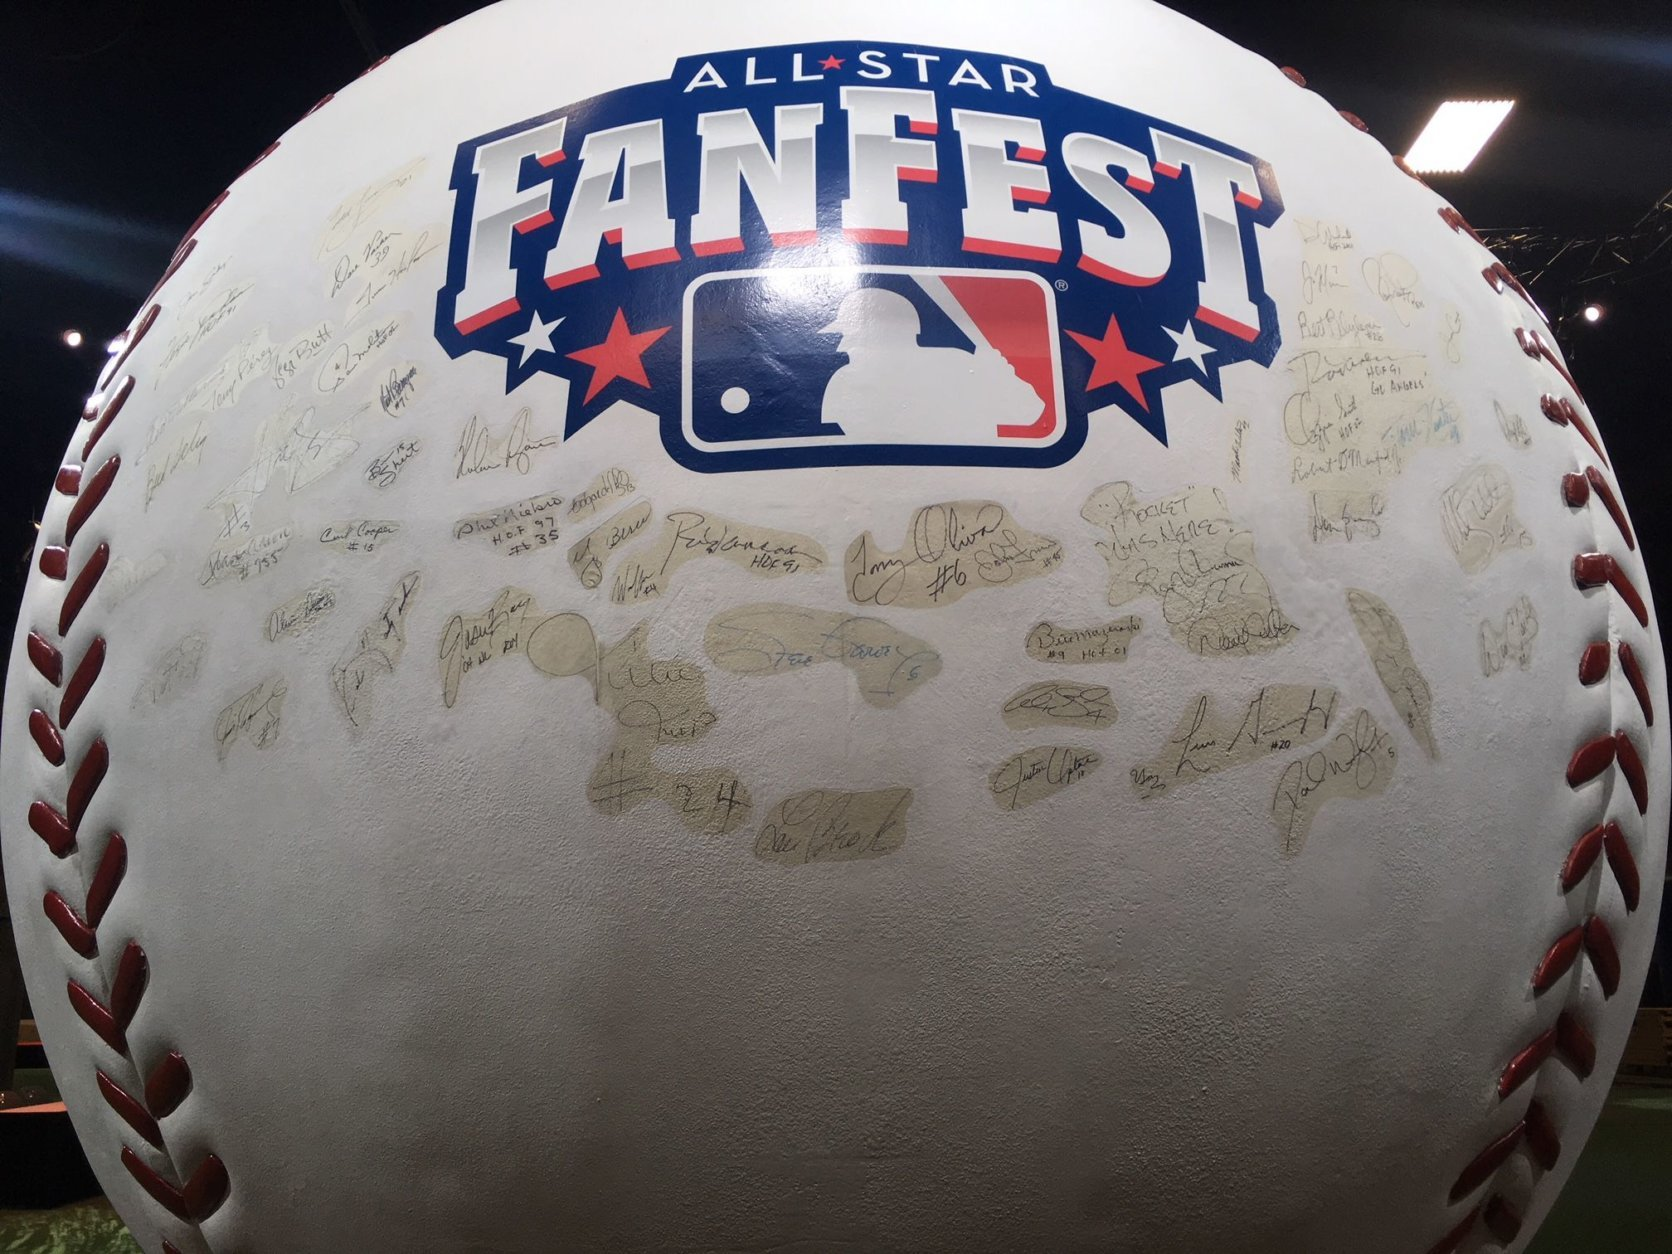 Major League Baseball's All-Star FanFest kicks off Friday morning at Walter E. Washington Convention Center. (WTOP/Noah Frank)